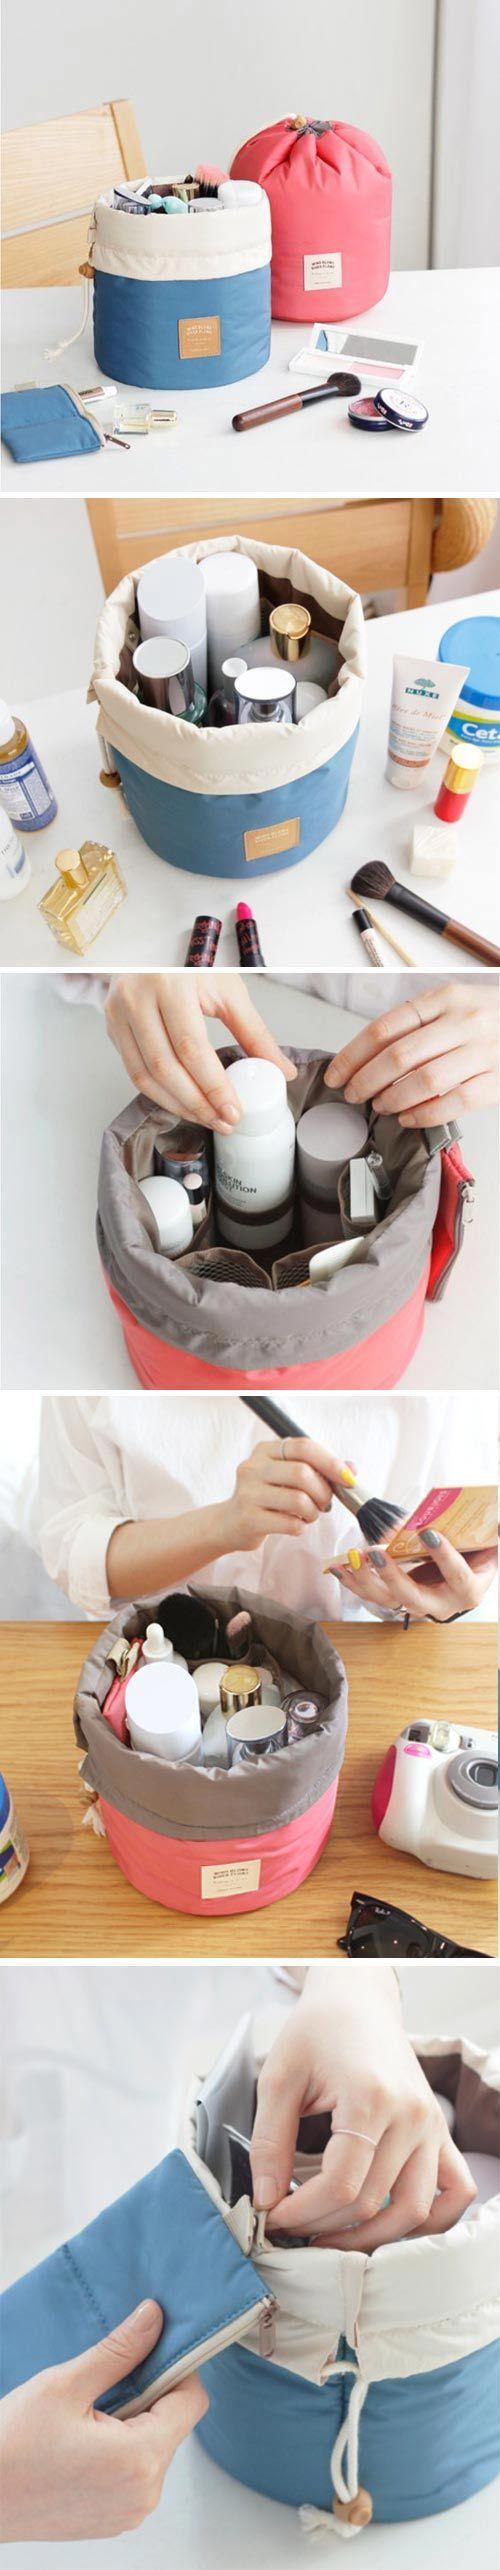 $5.47 Woman Cosmetic Storage Kit Toiletry Kit Bathroom Amenities Travel Storage Bag